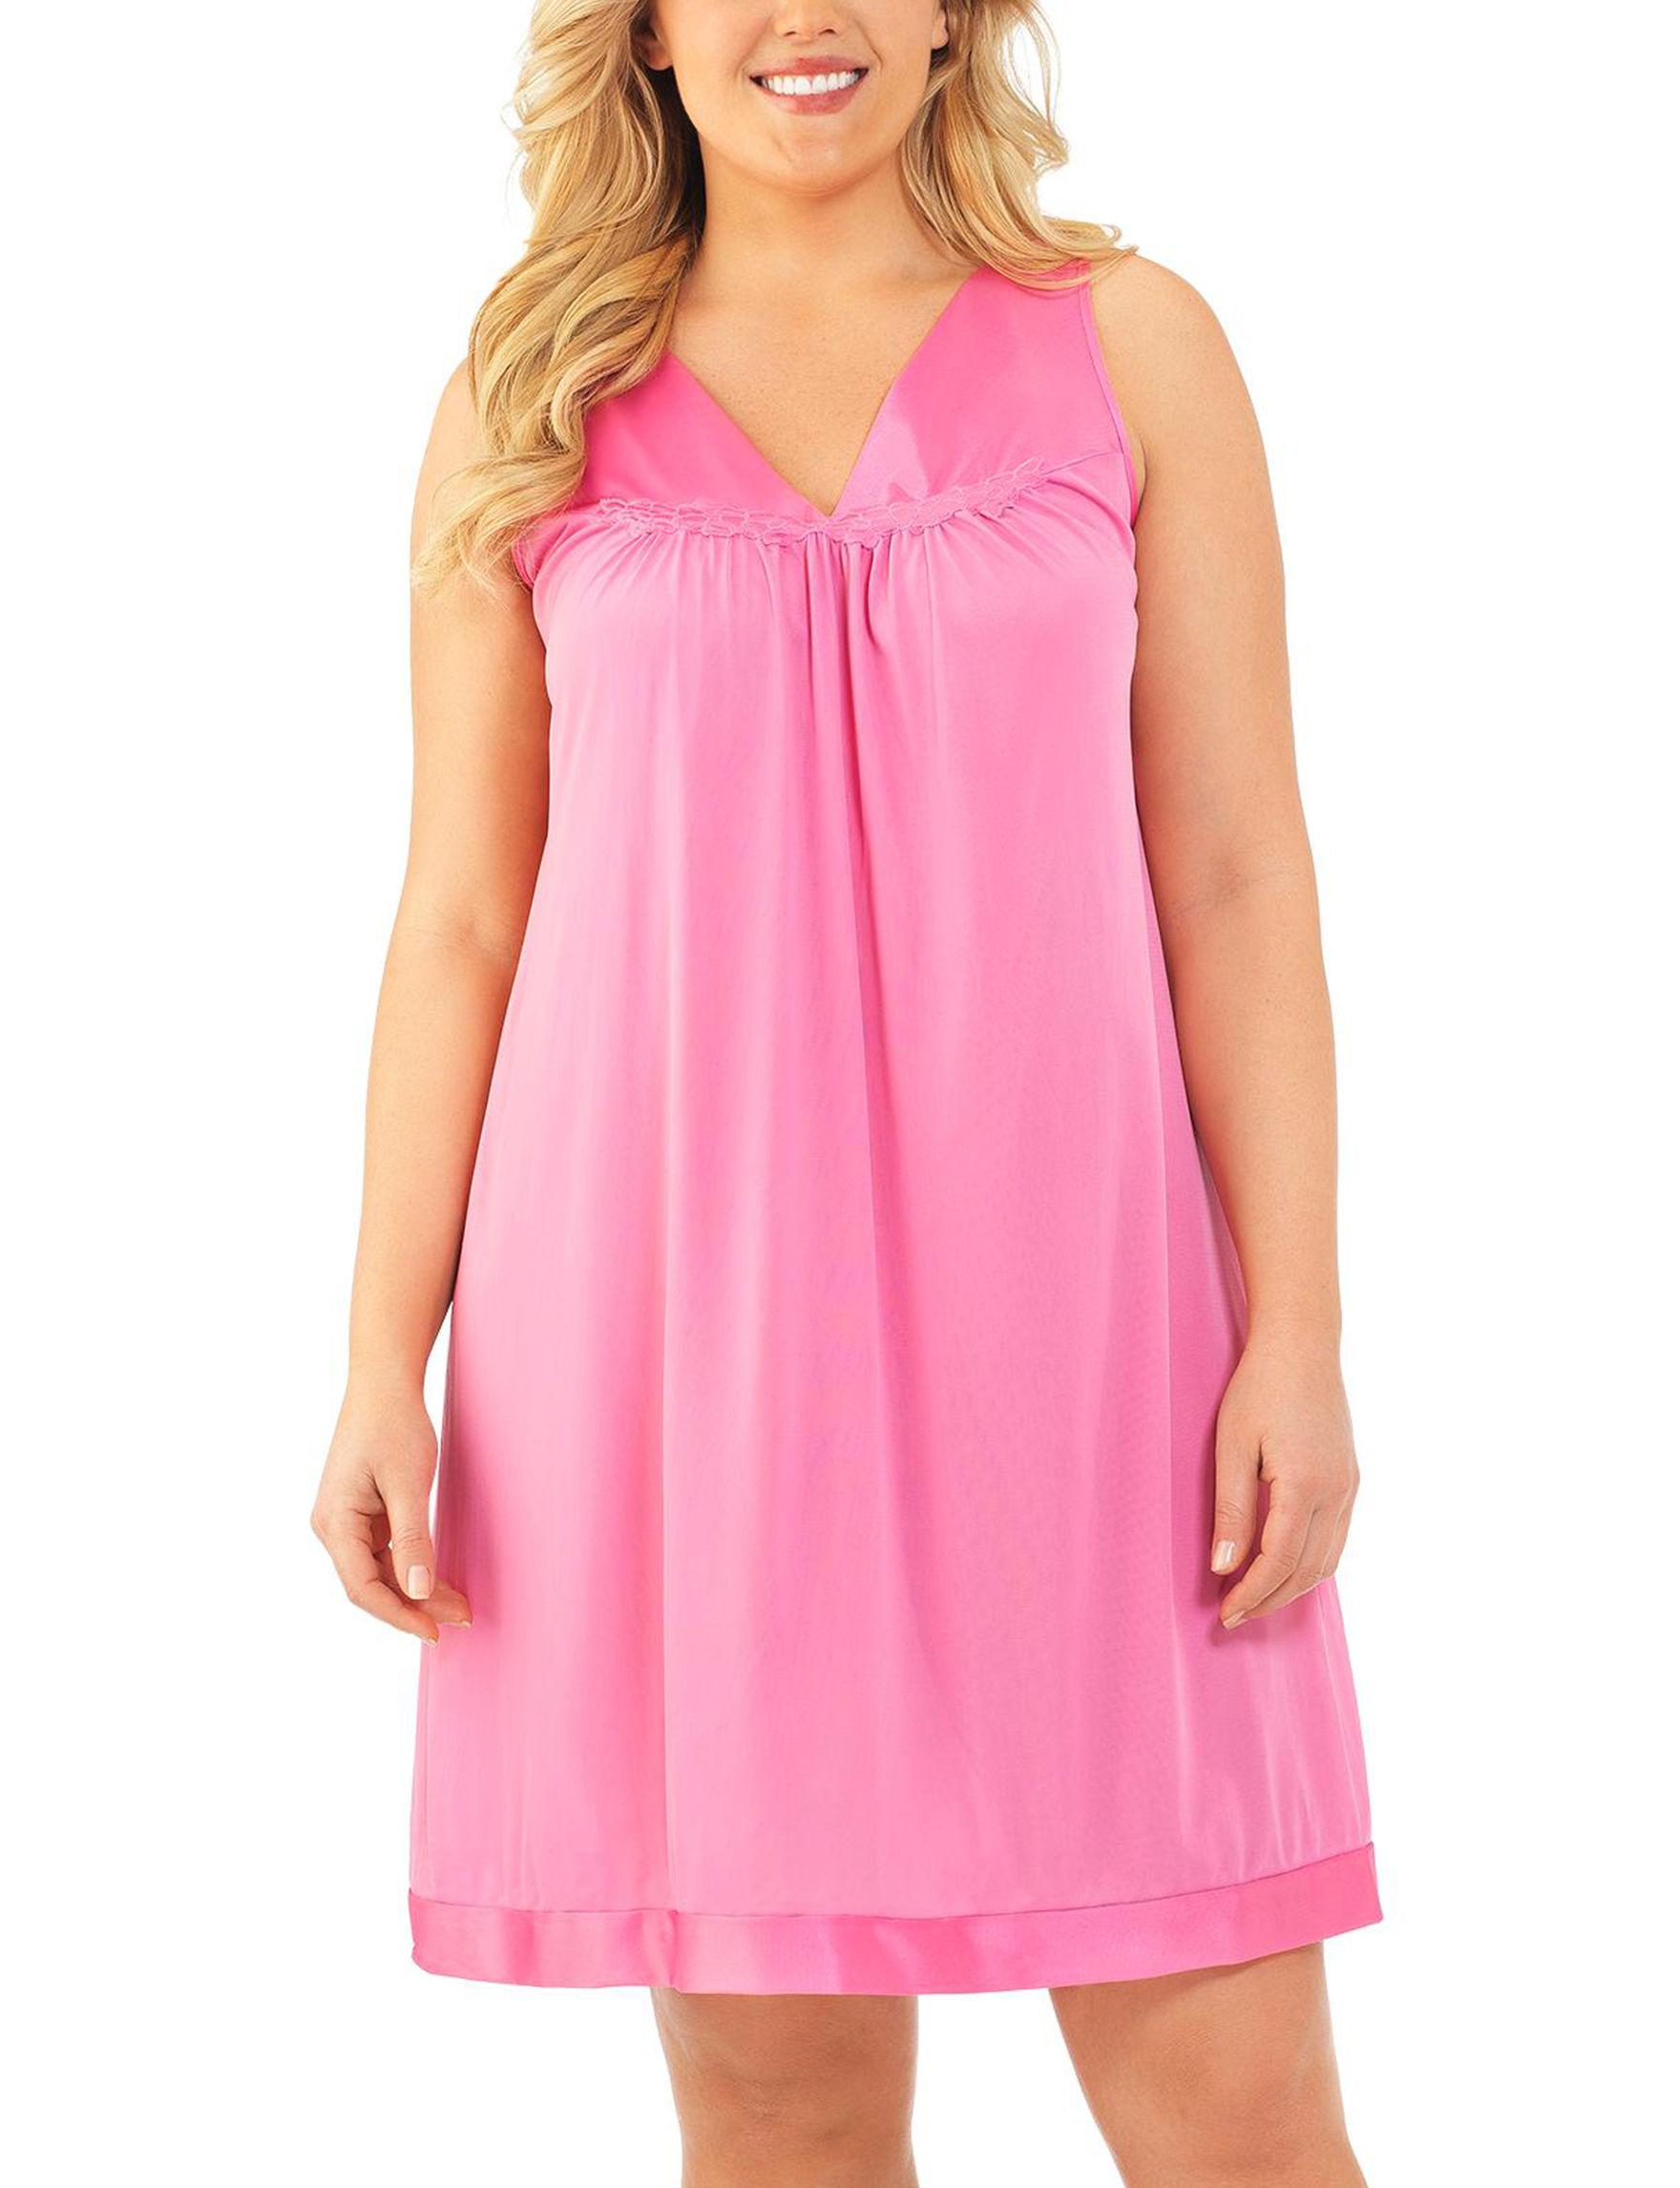 Vanity Fair Pink Nightgowns & Sleep Shirts